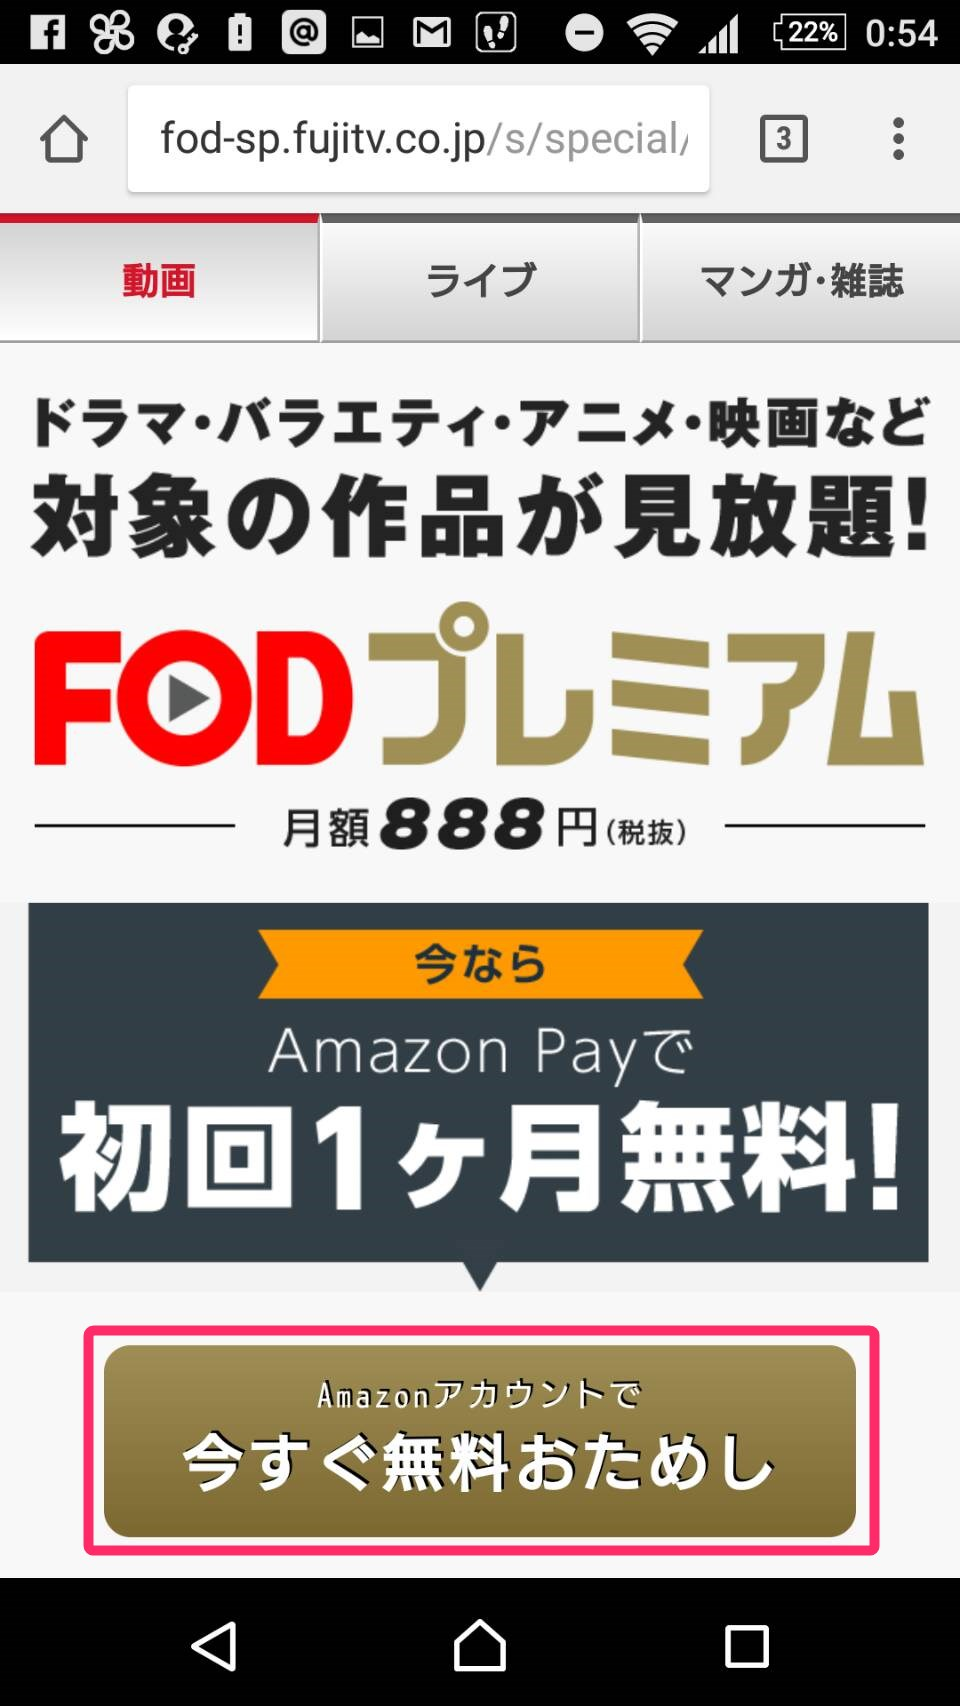 FODプレミアムのAmazonPayを使った1か月無料お試し登録の画像